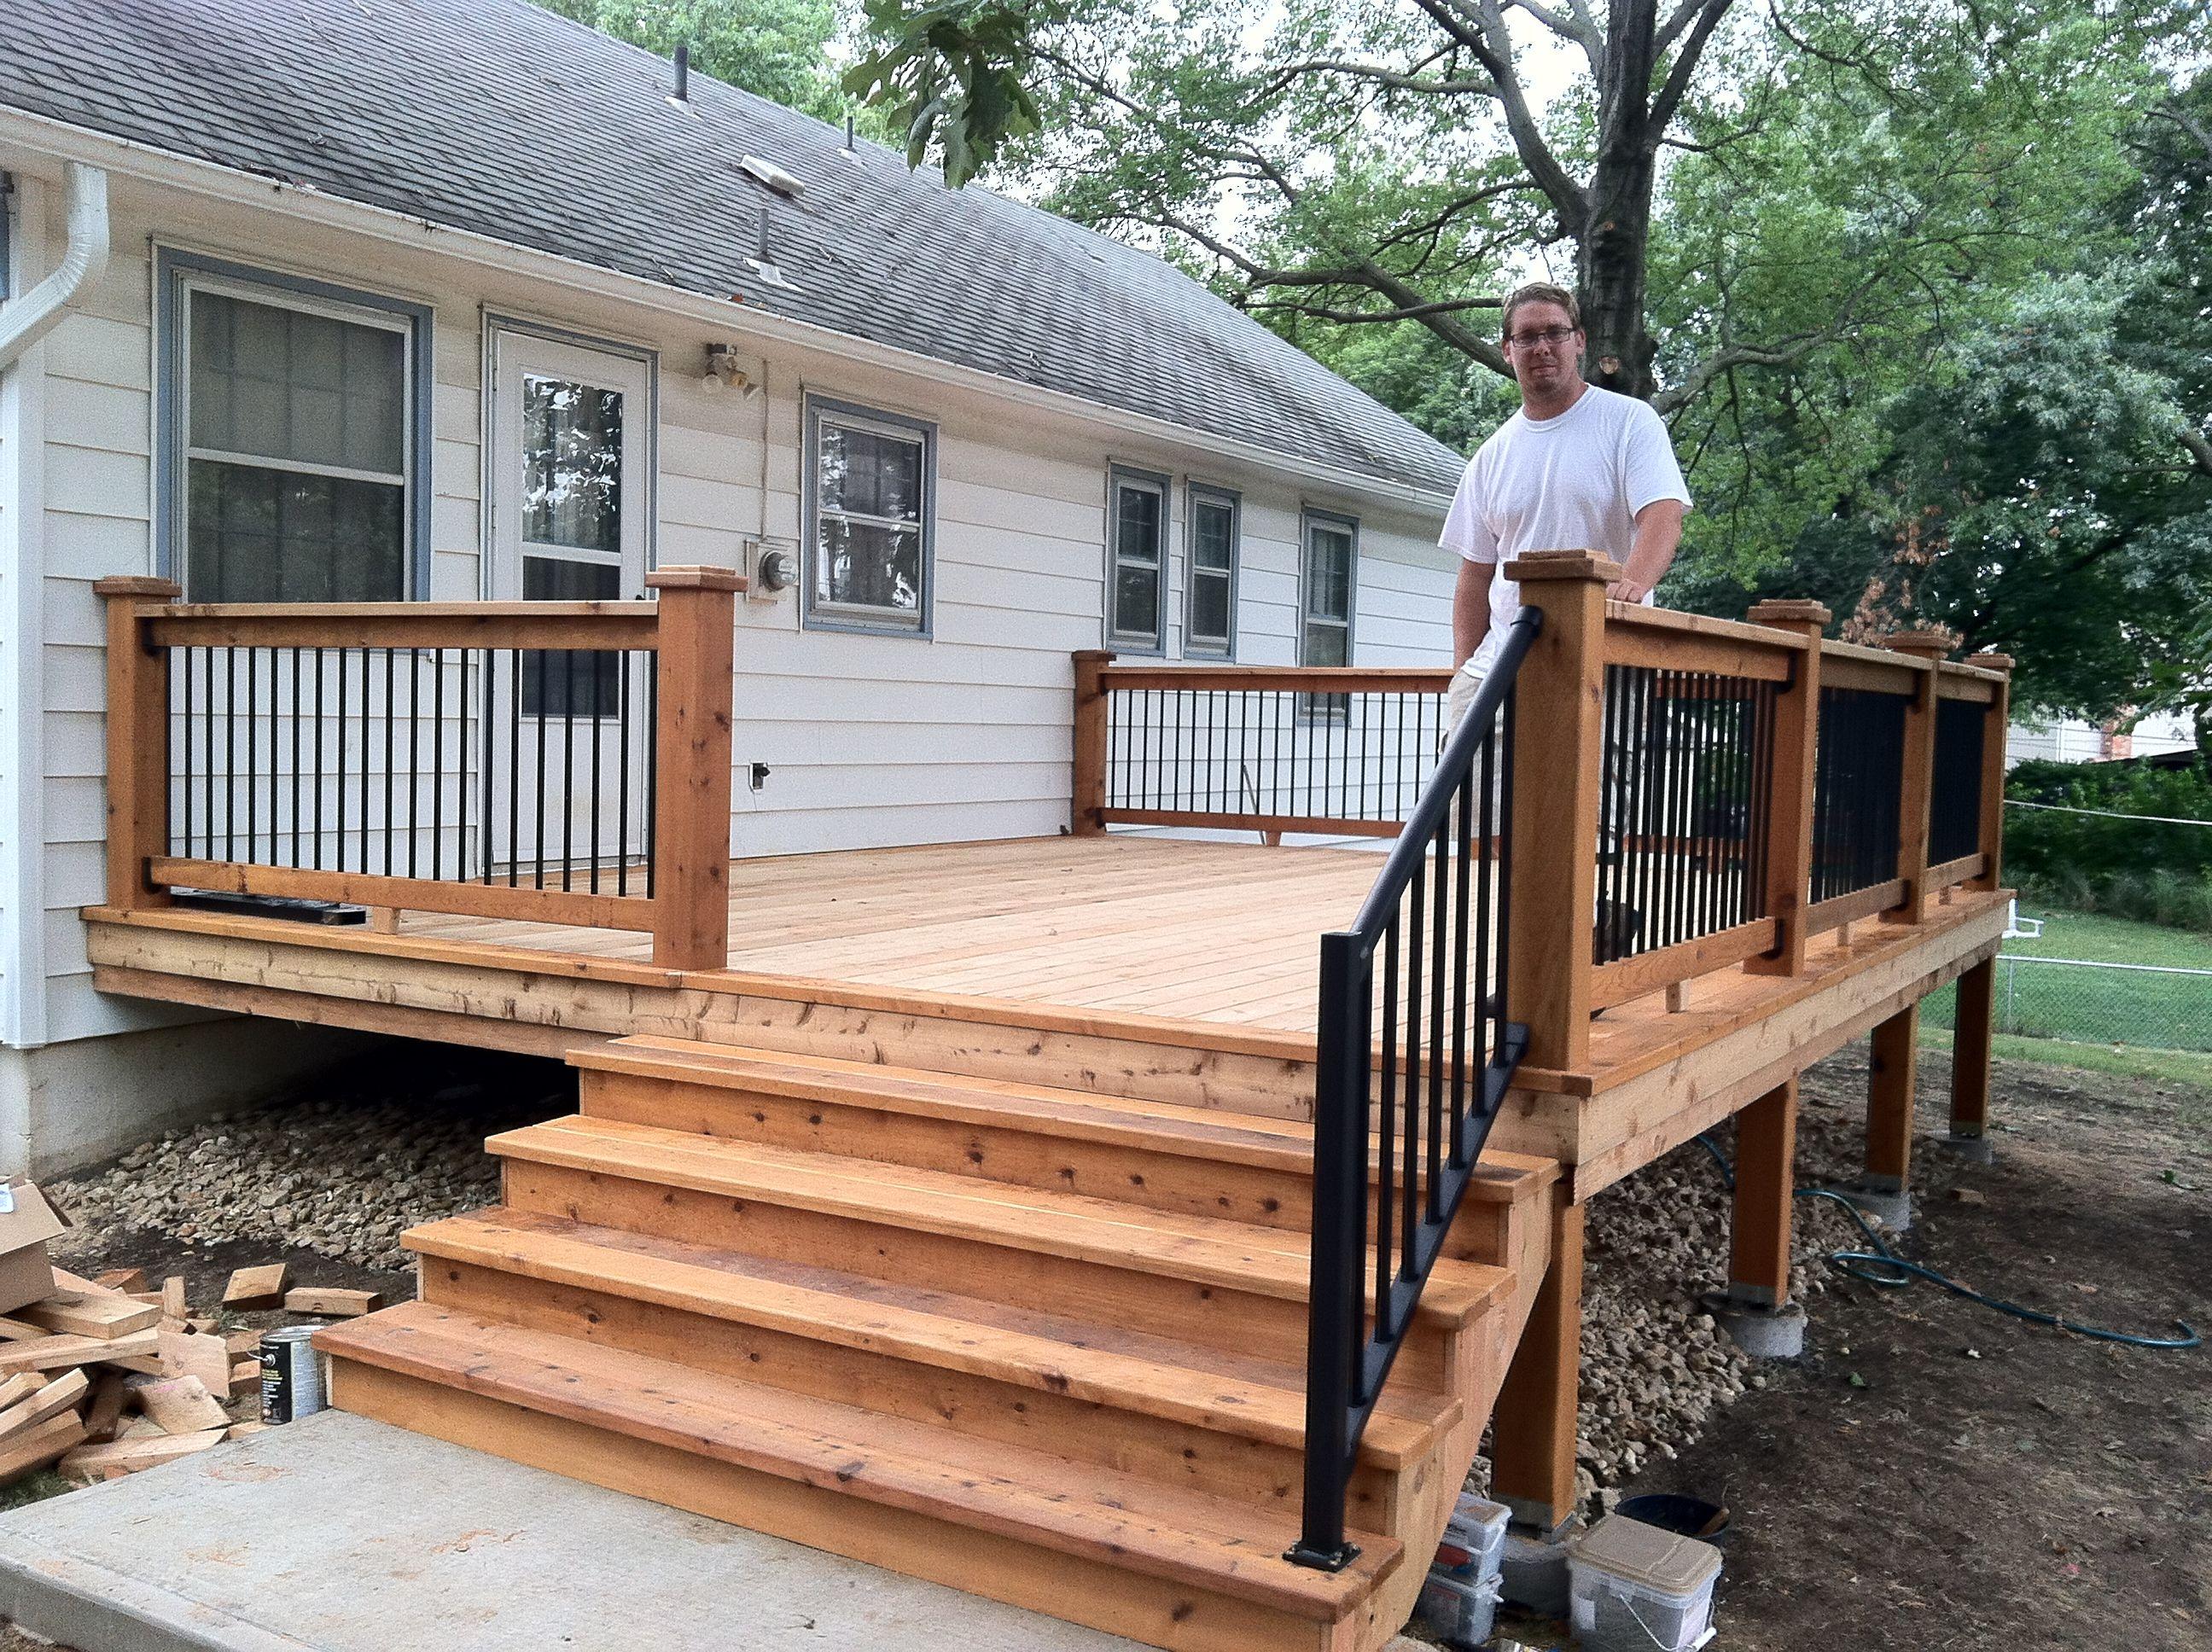 A Small Back Deck Patio Deck Designs Deck Designs Backyard Back Deck Designs